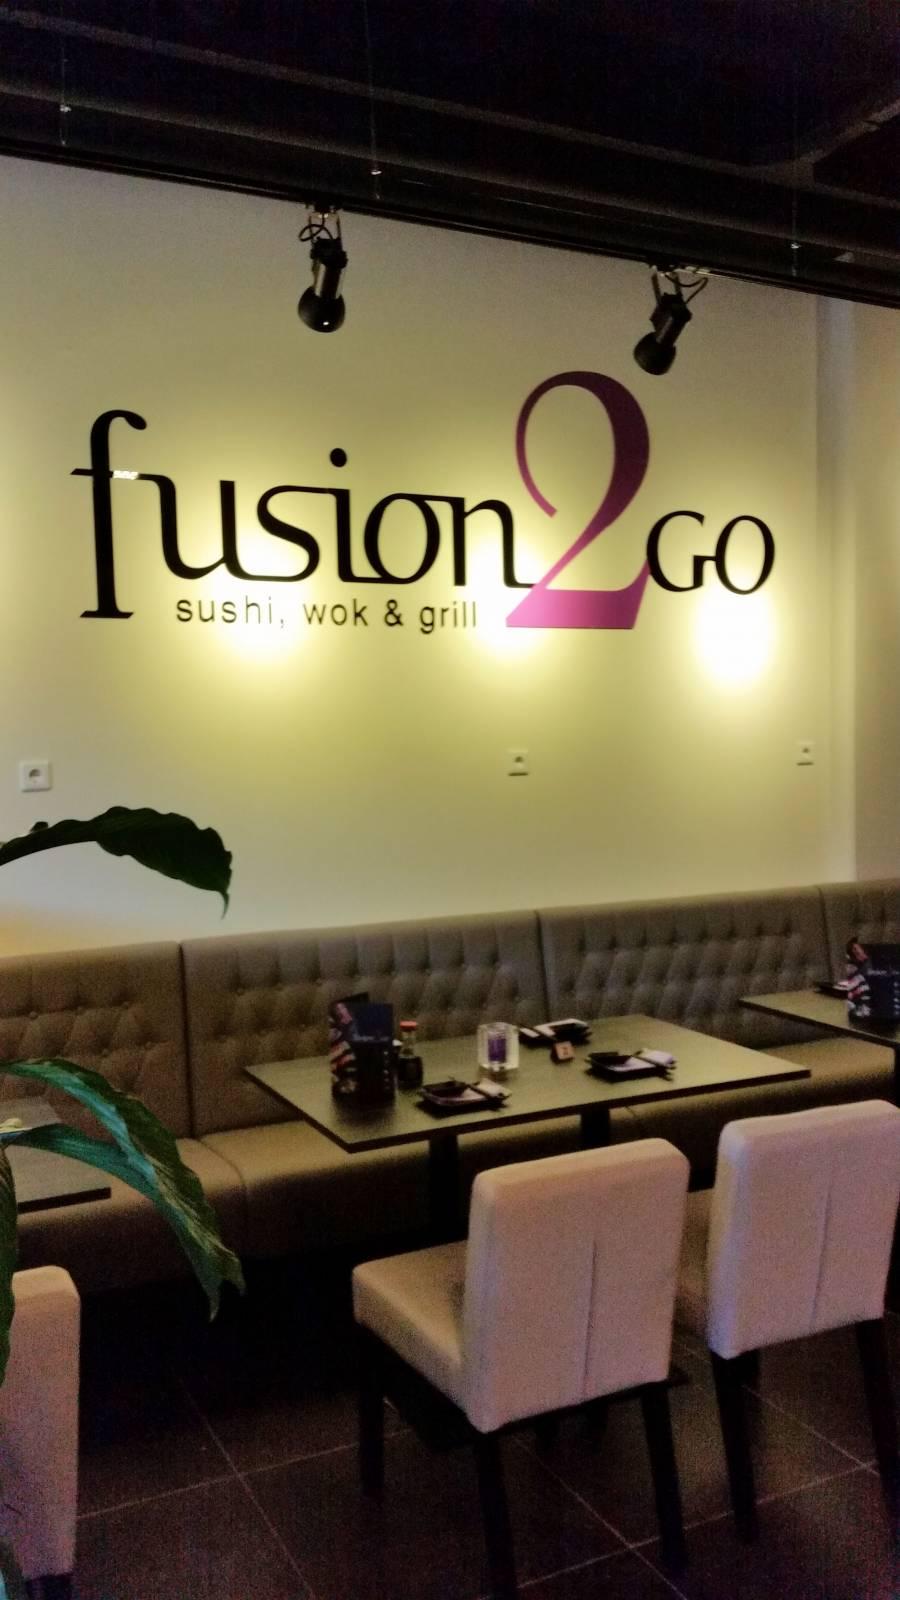 fusion 2 go utrecht